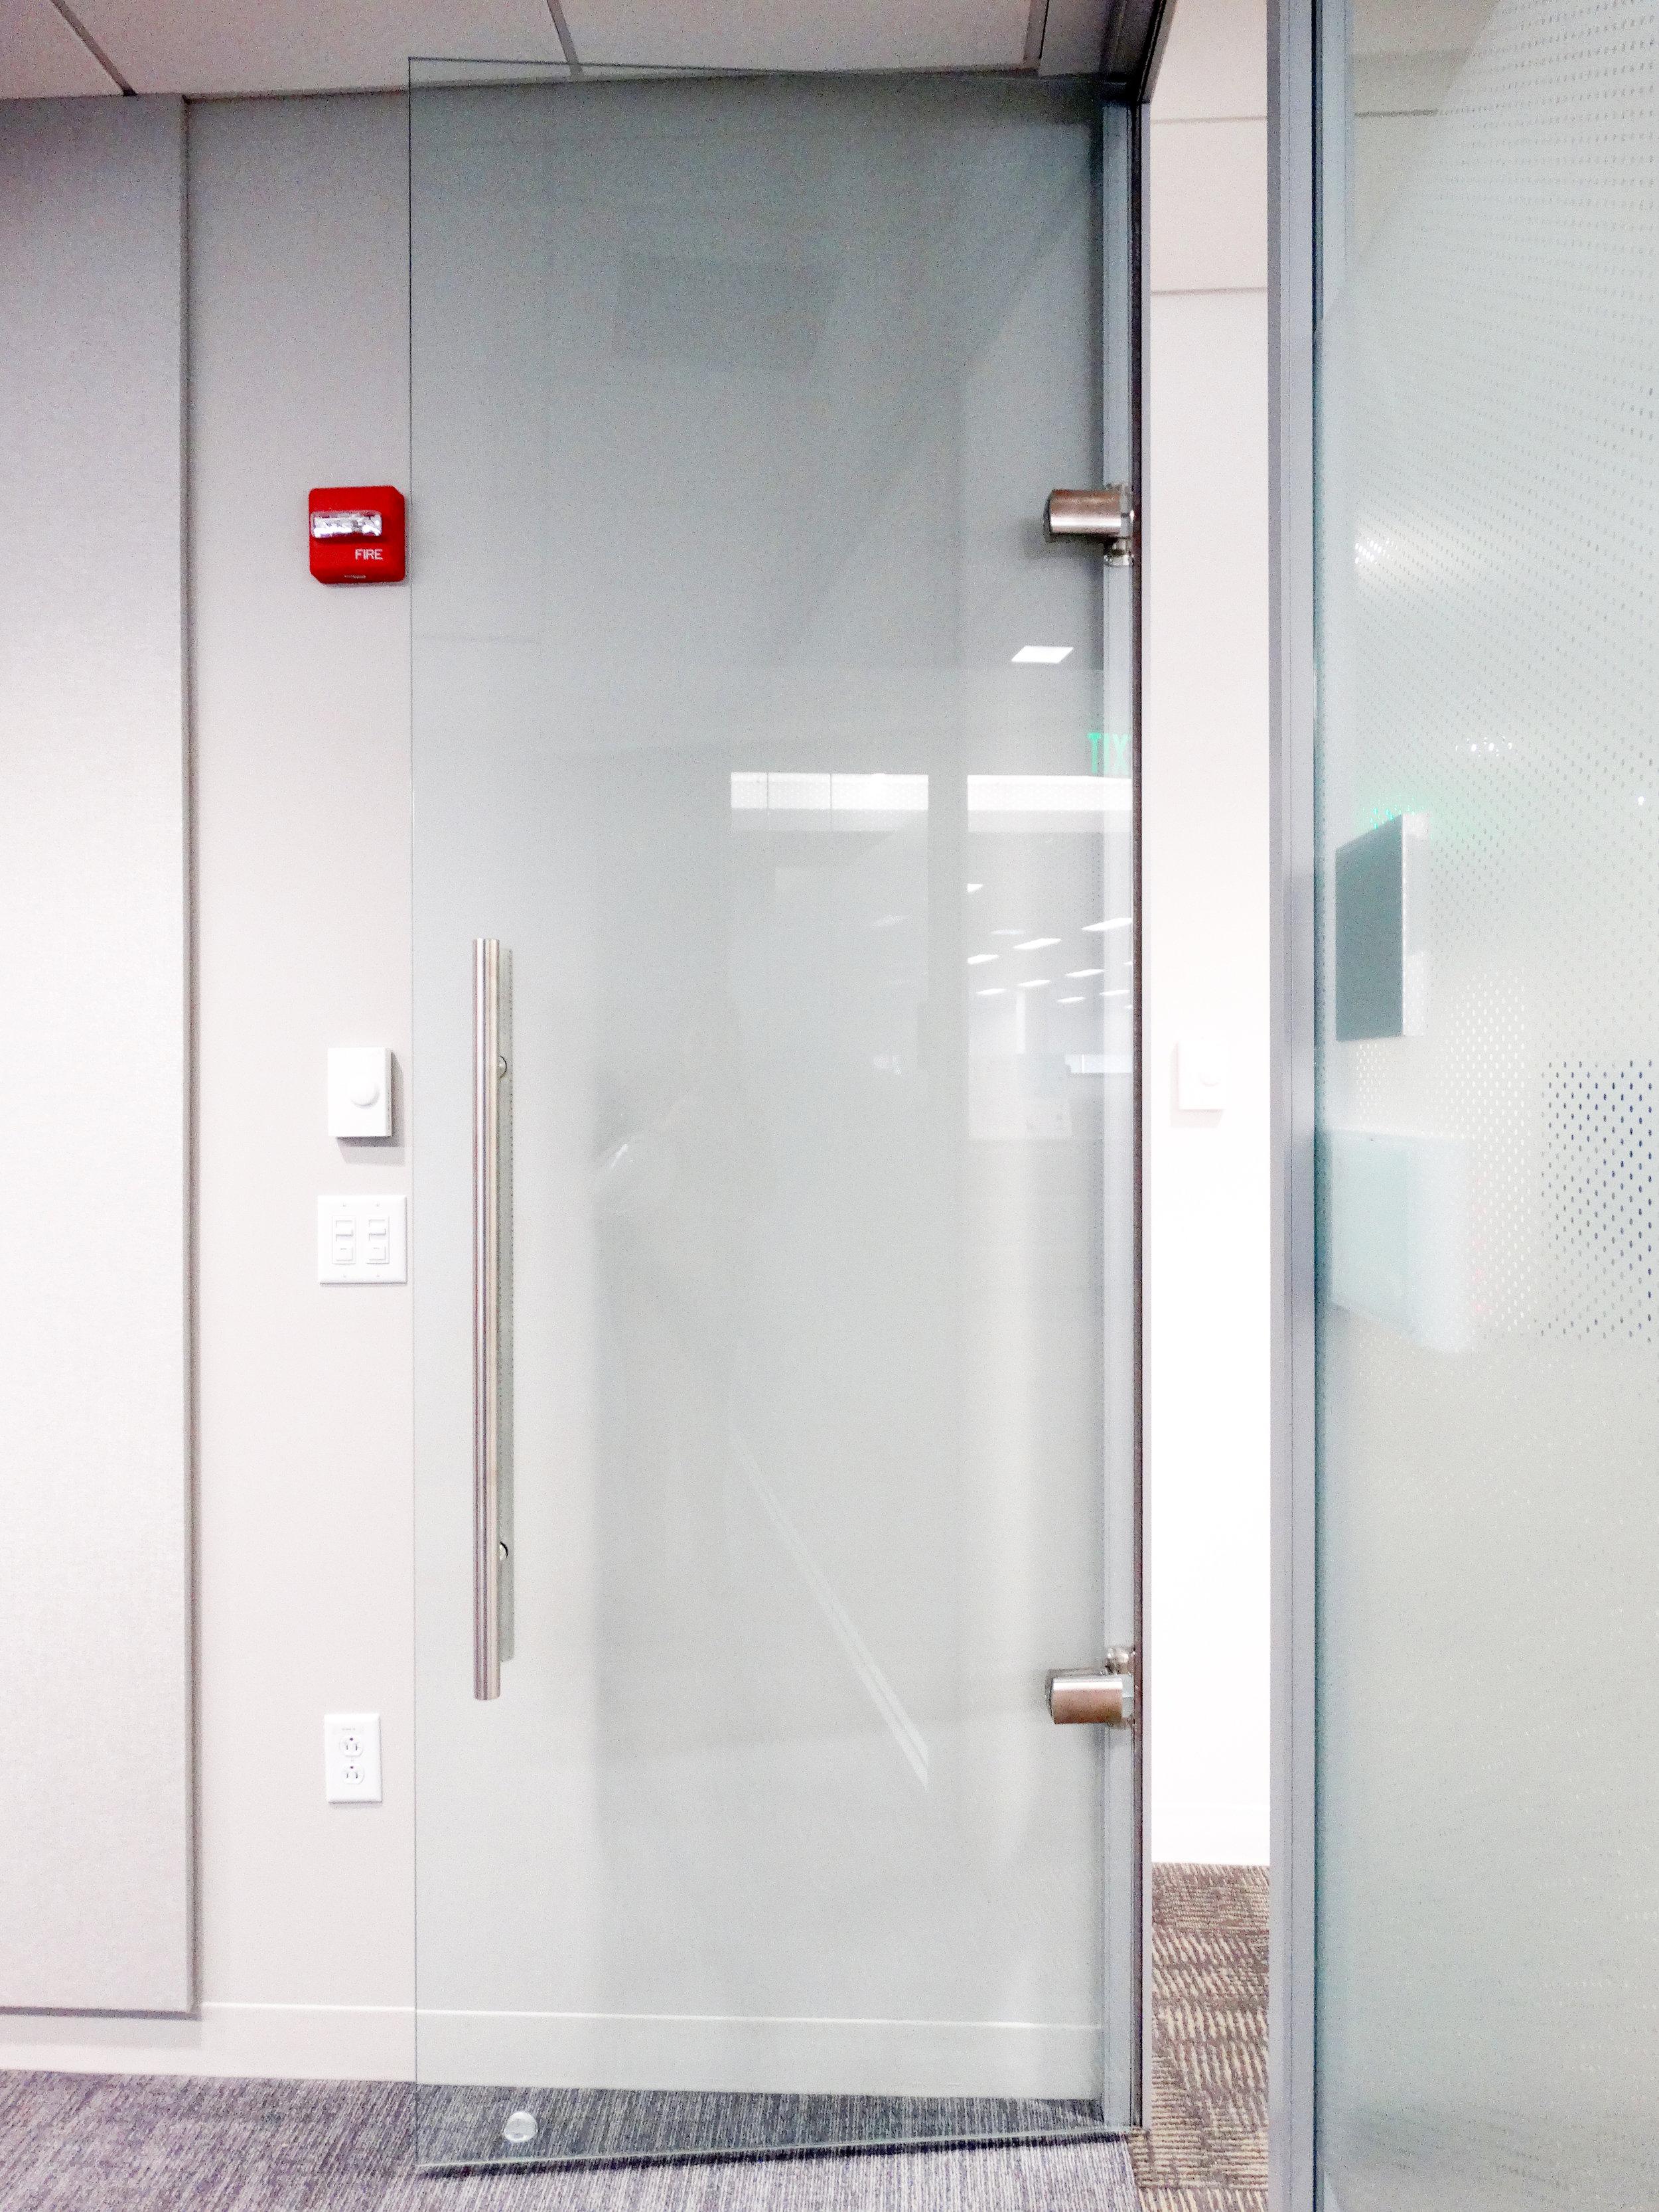 Litespace Frameless Glass Door Hydraulic Glass Hinges - Spaceworks AI.jpg